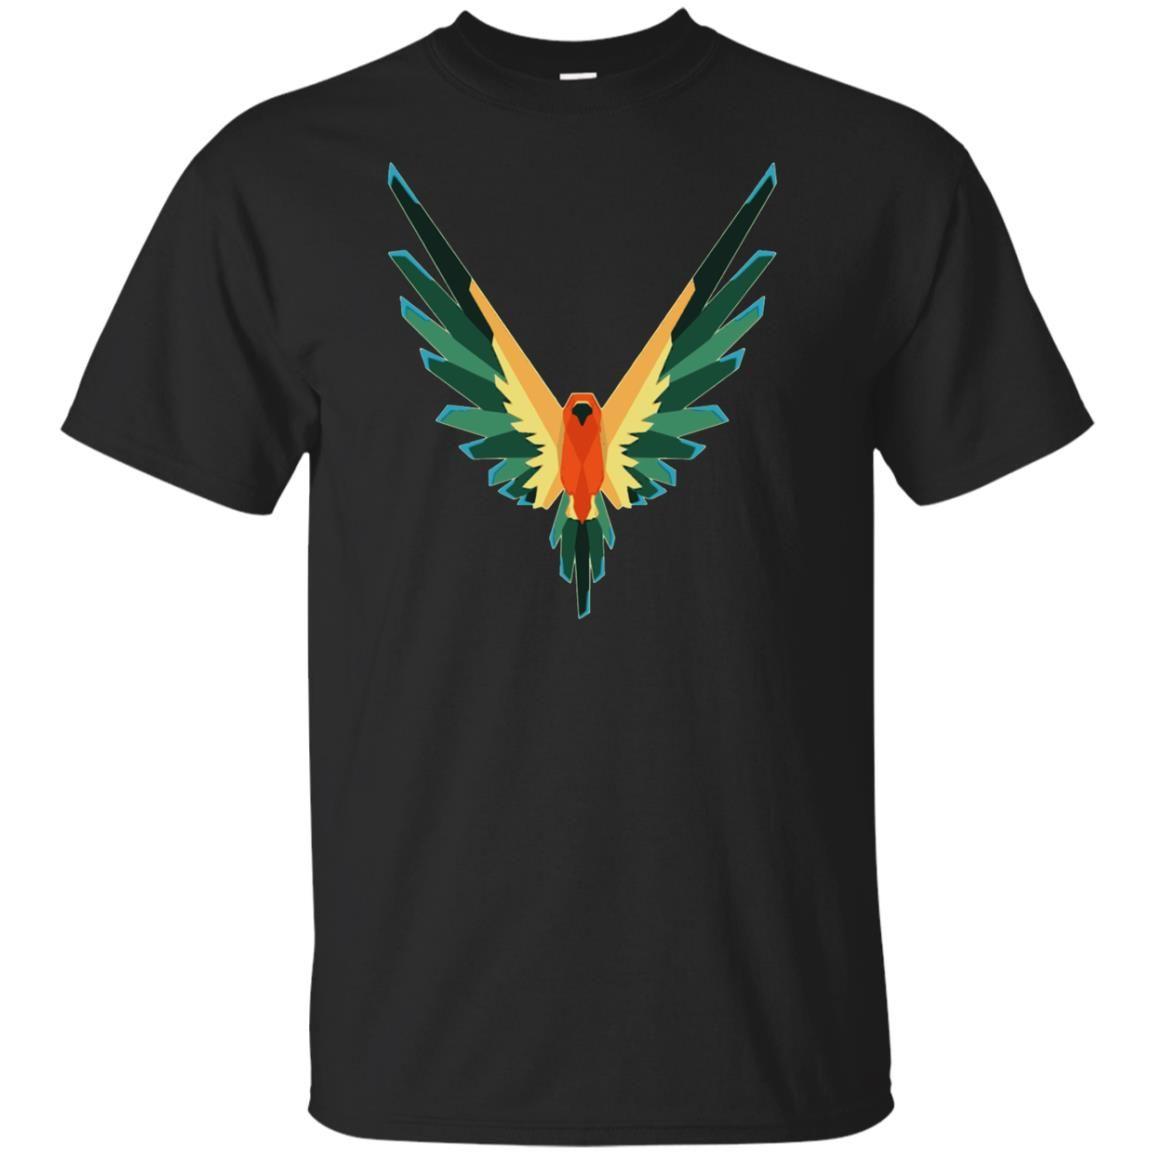 image 1237 - Logan Paul Maverick kid shirt & sweatshirt